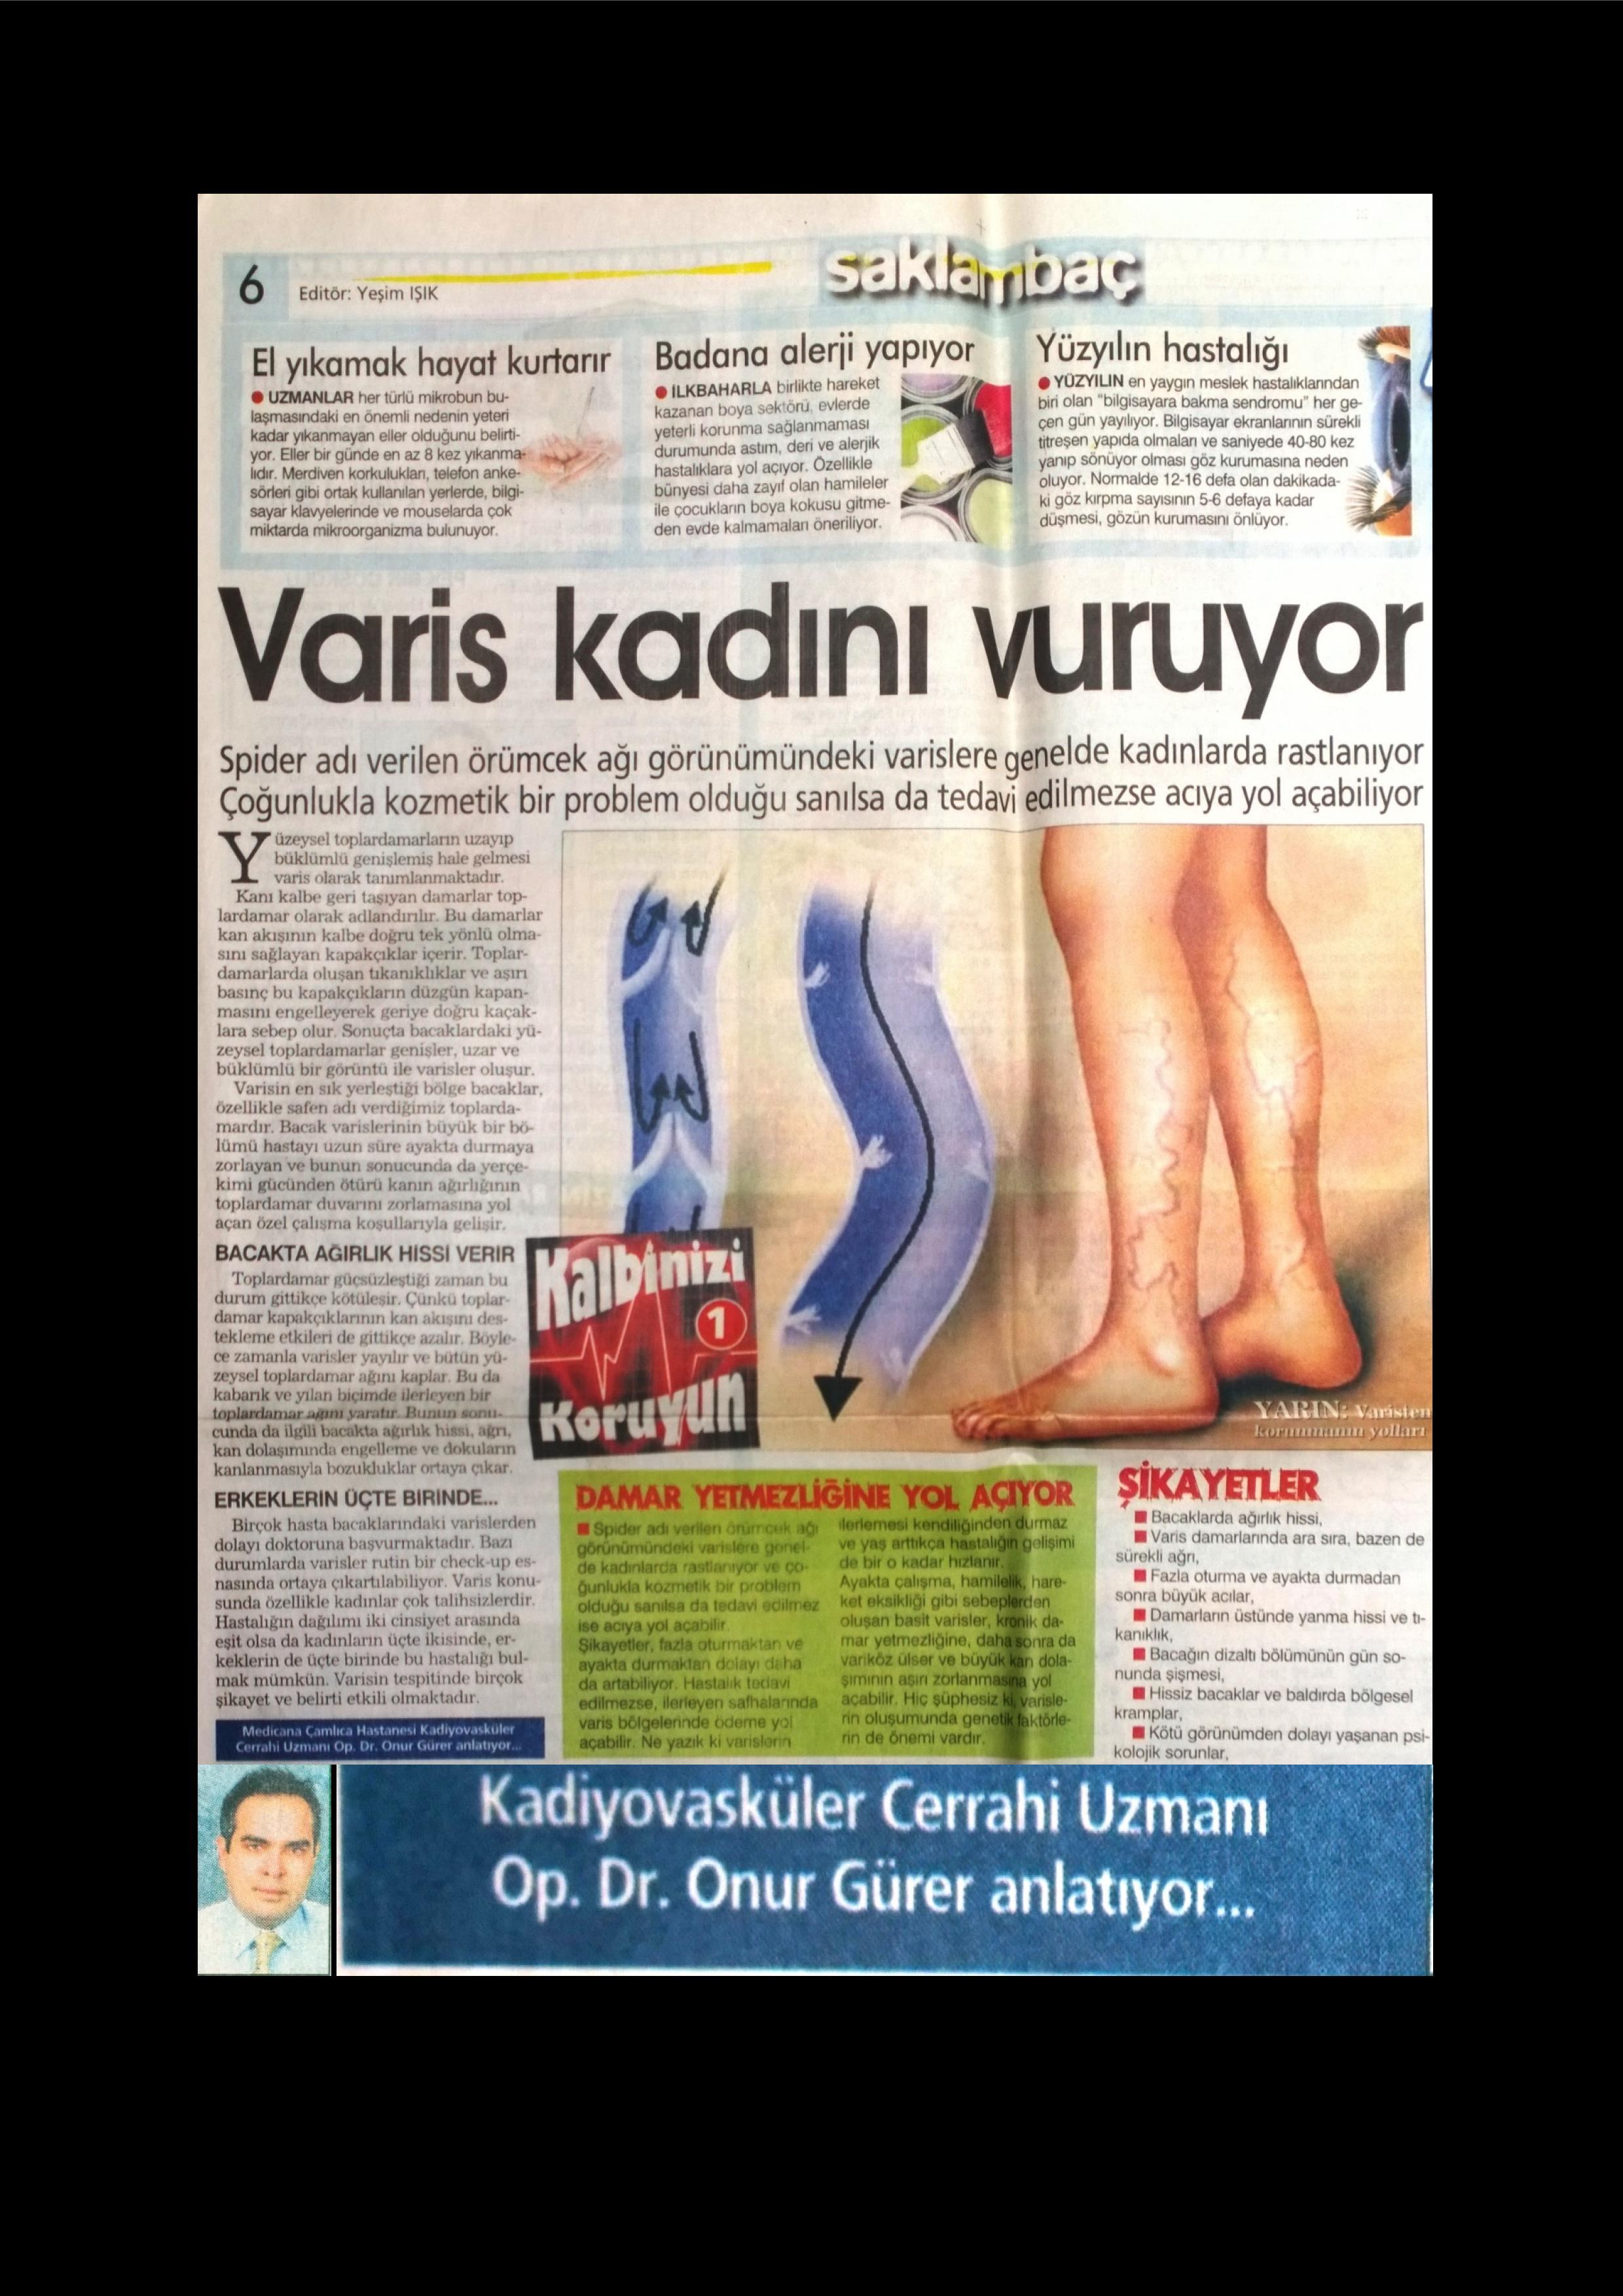 varis1_01